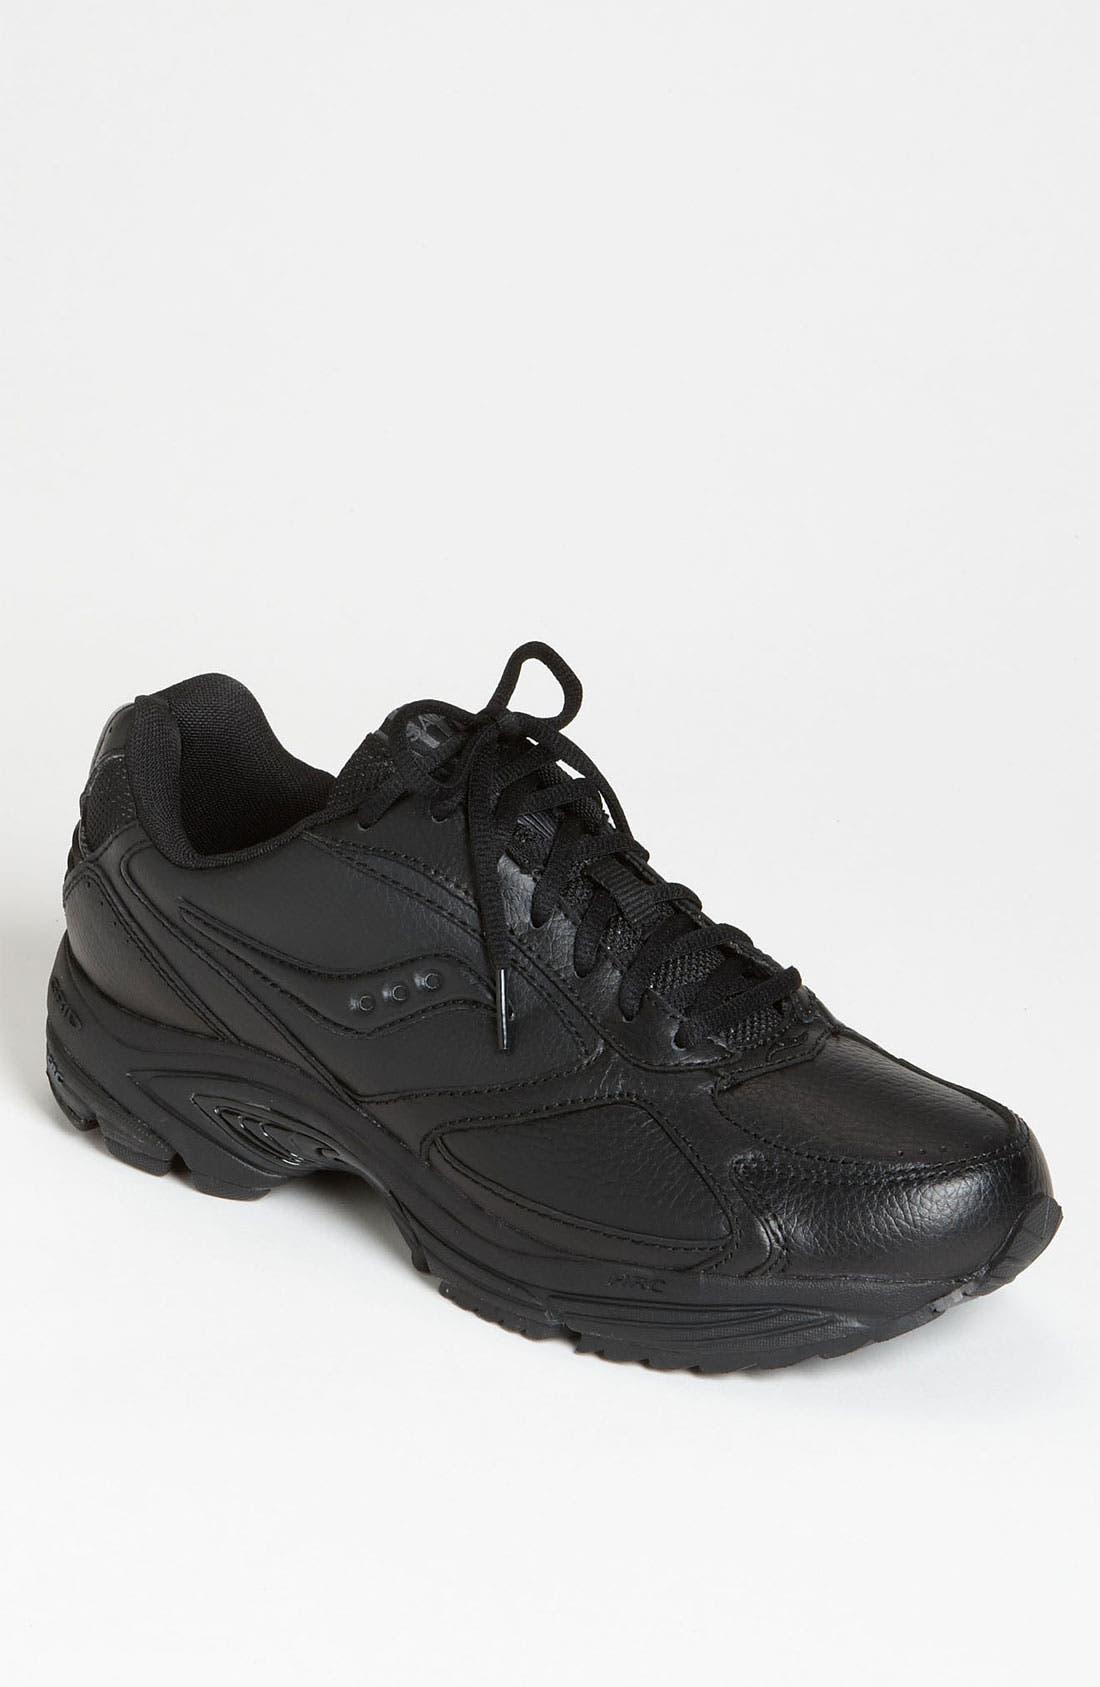 Main Image - Saucony 'Grid Omni' Walking Shoe (Men) (Online Only)